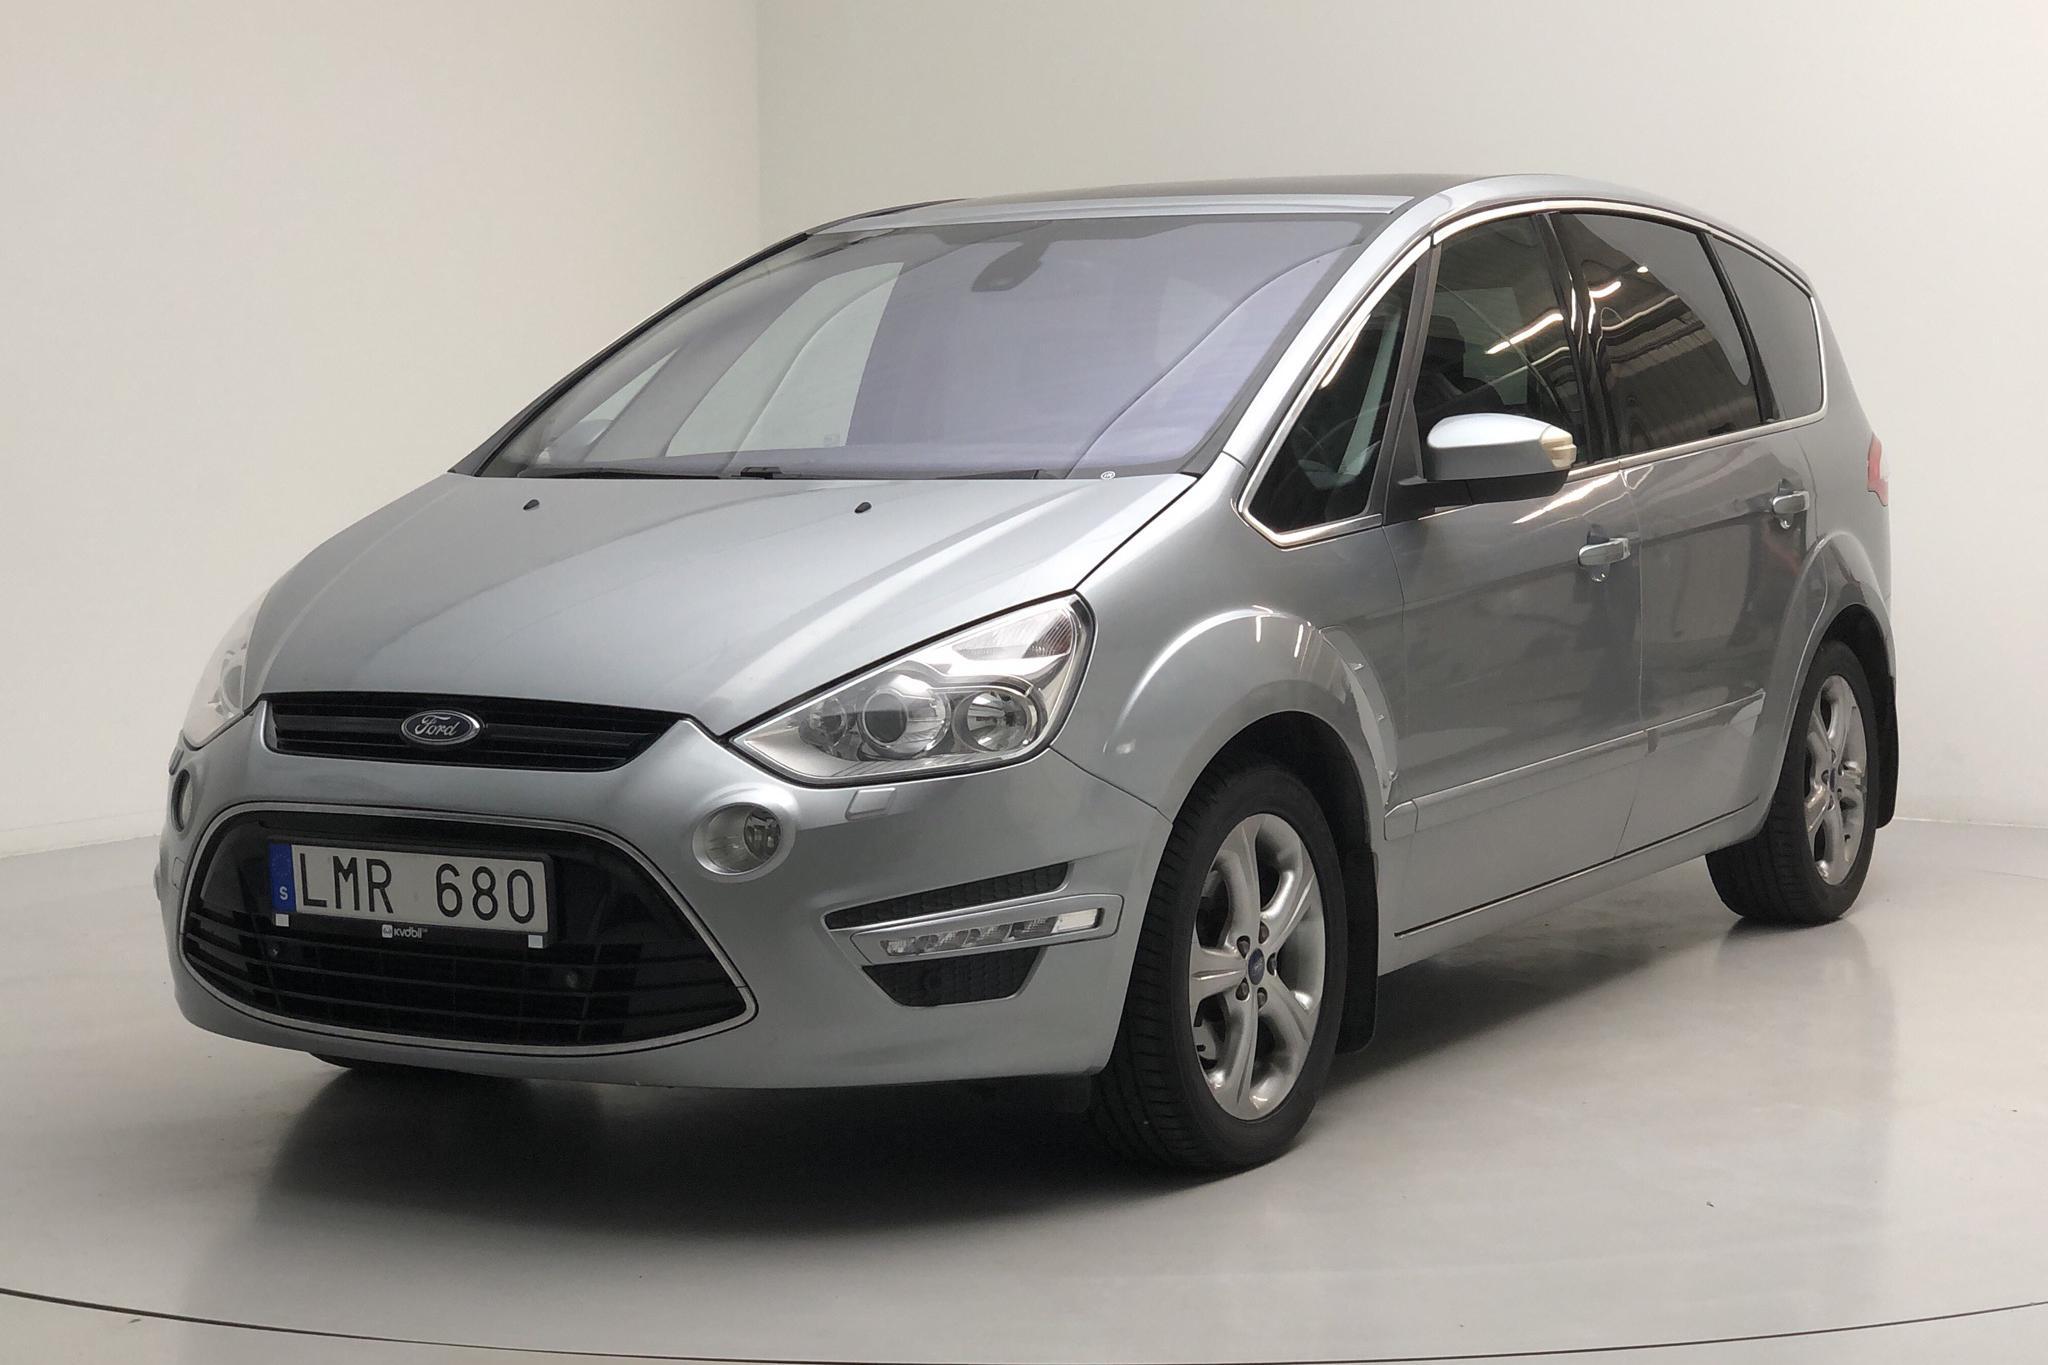 Ford S-MAX 2.2 Duratorq TDCi (200hk)